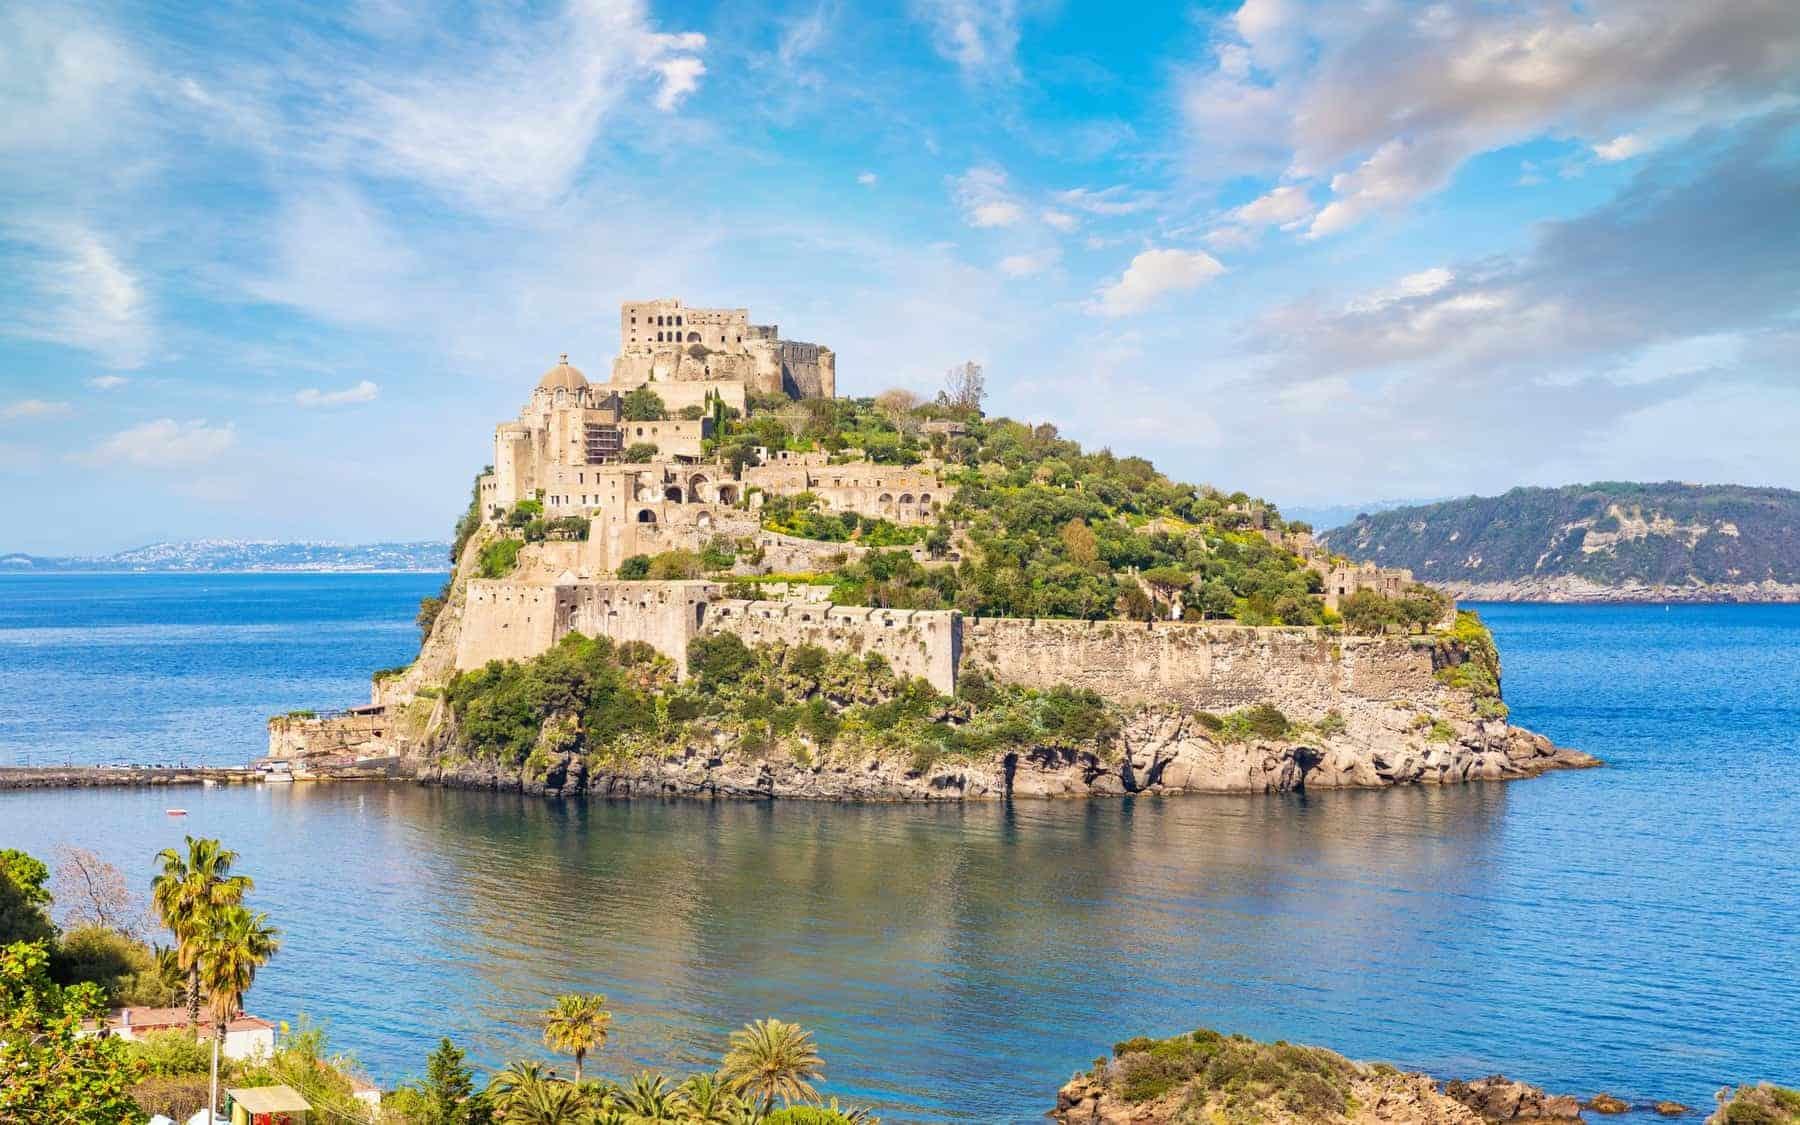 Aragonese Castle or Castello Aragonese is most visited landmark and tourist destination near Ischia island, Italy.